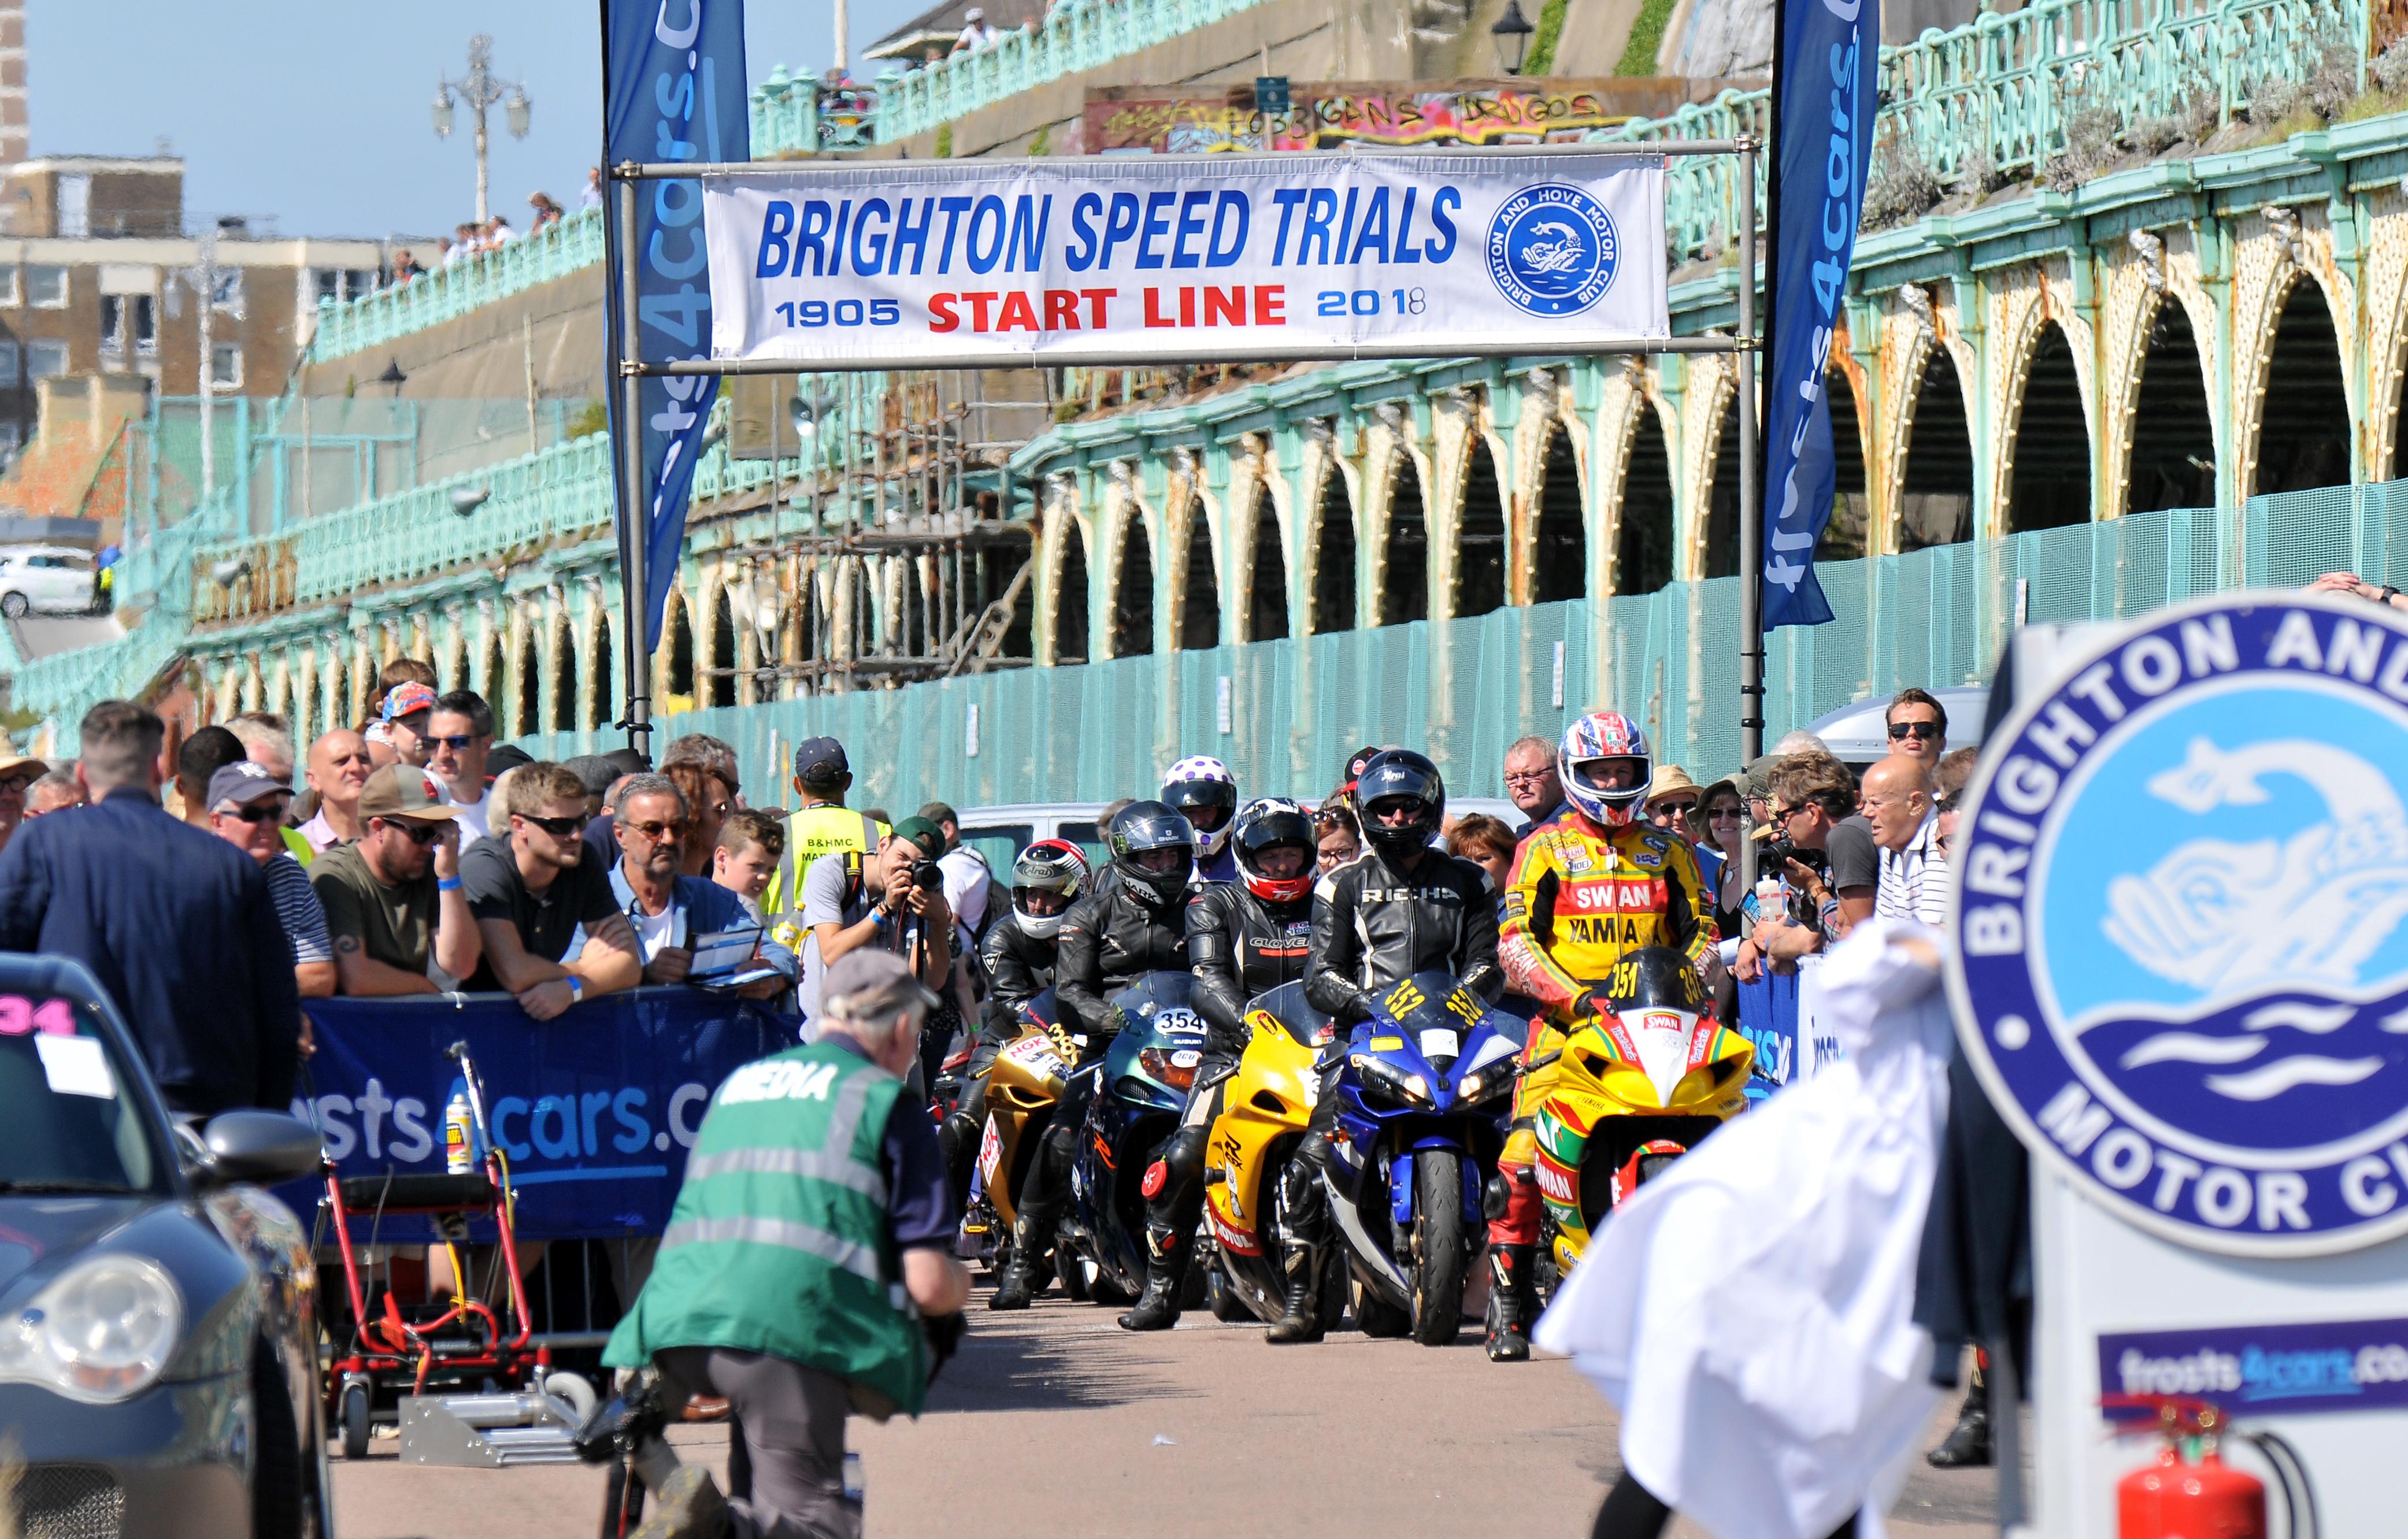 Brighton Speed Trial 2018